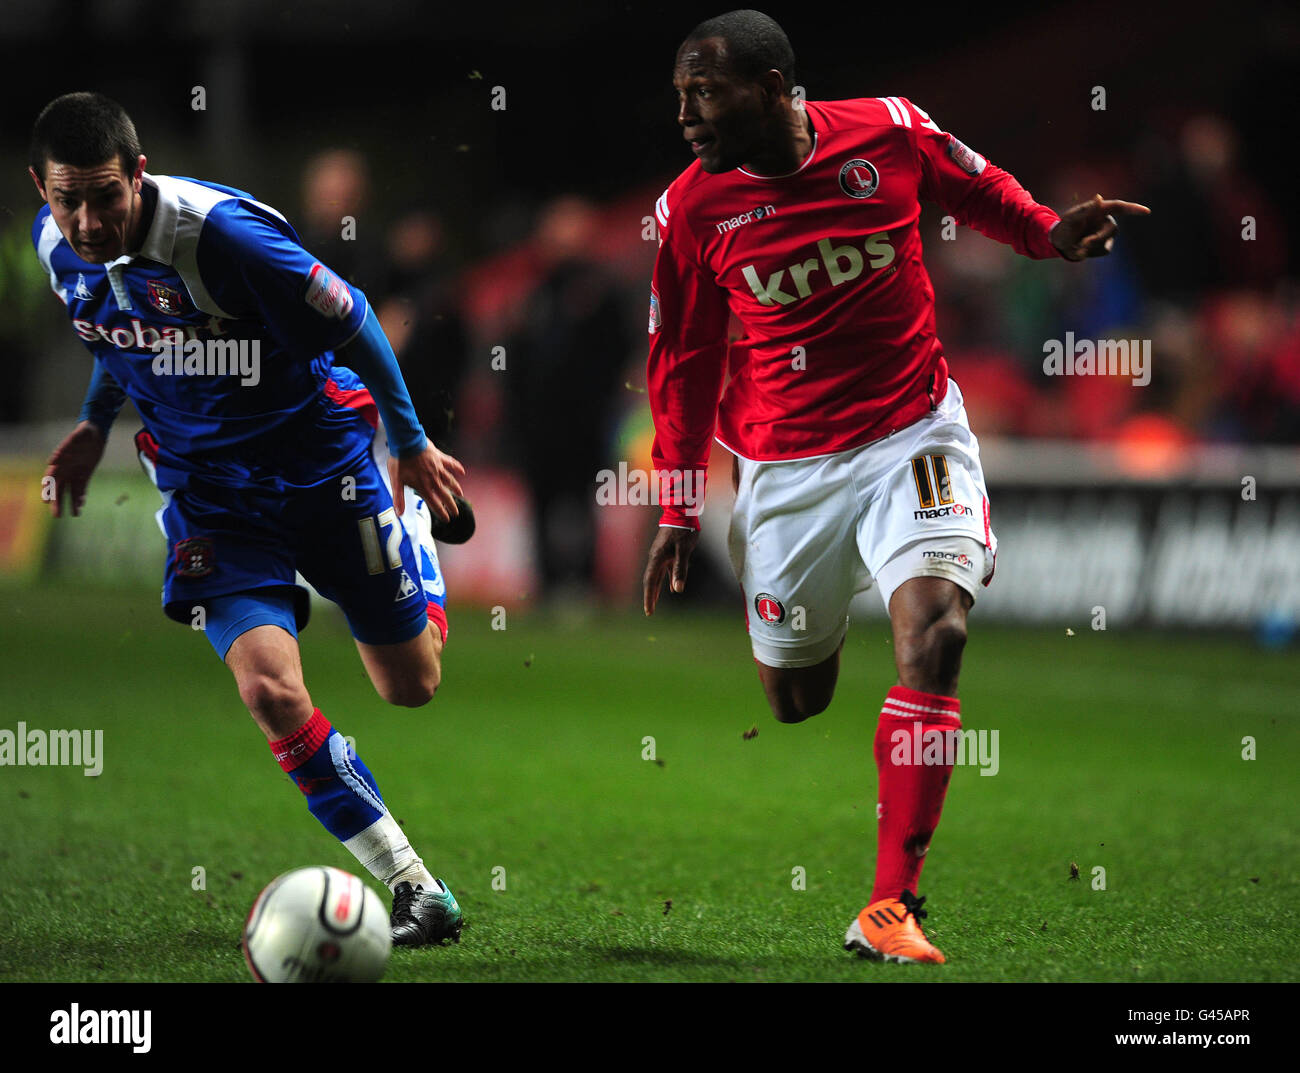 Soccer - npower Football League One - Charlton Athletic v Carlisle United - The Valley - Stock Image